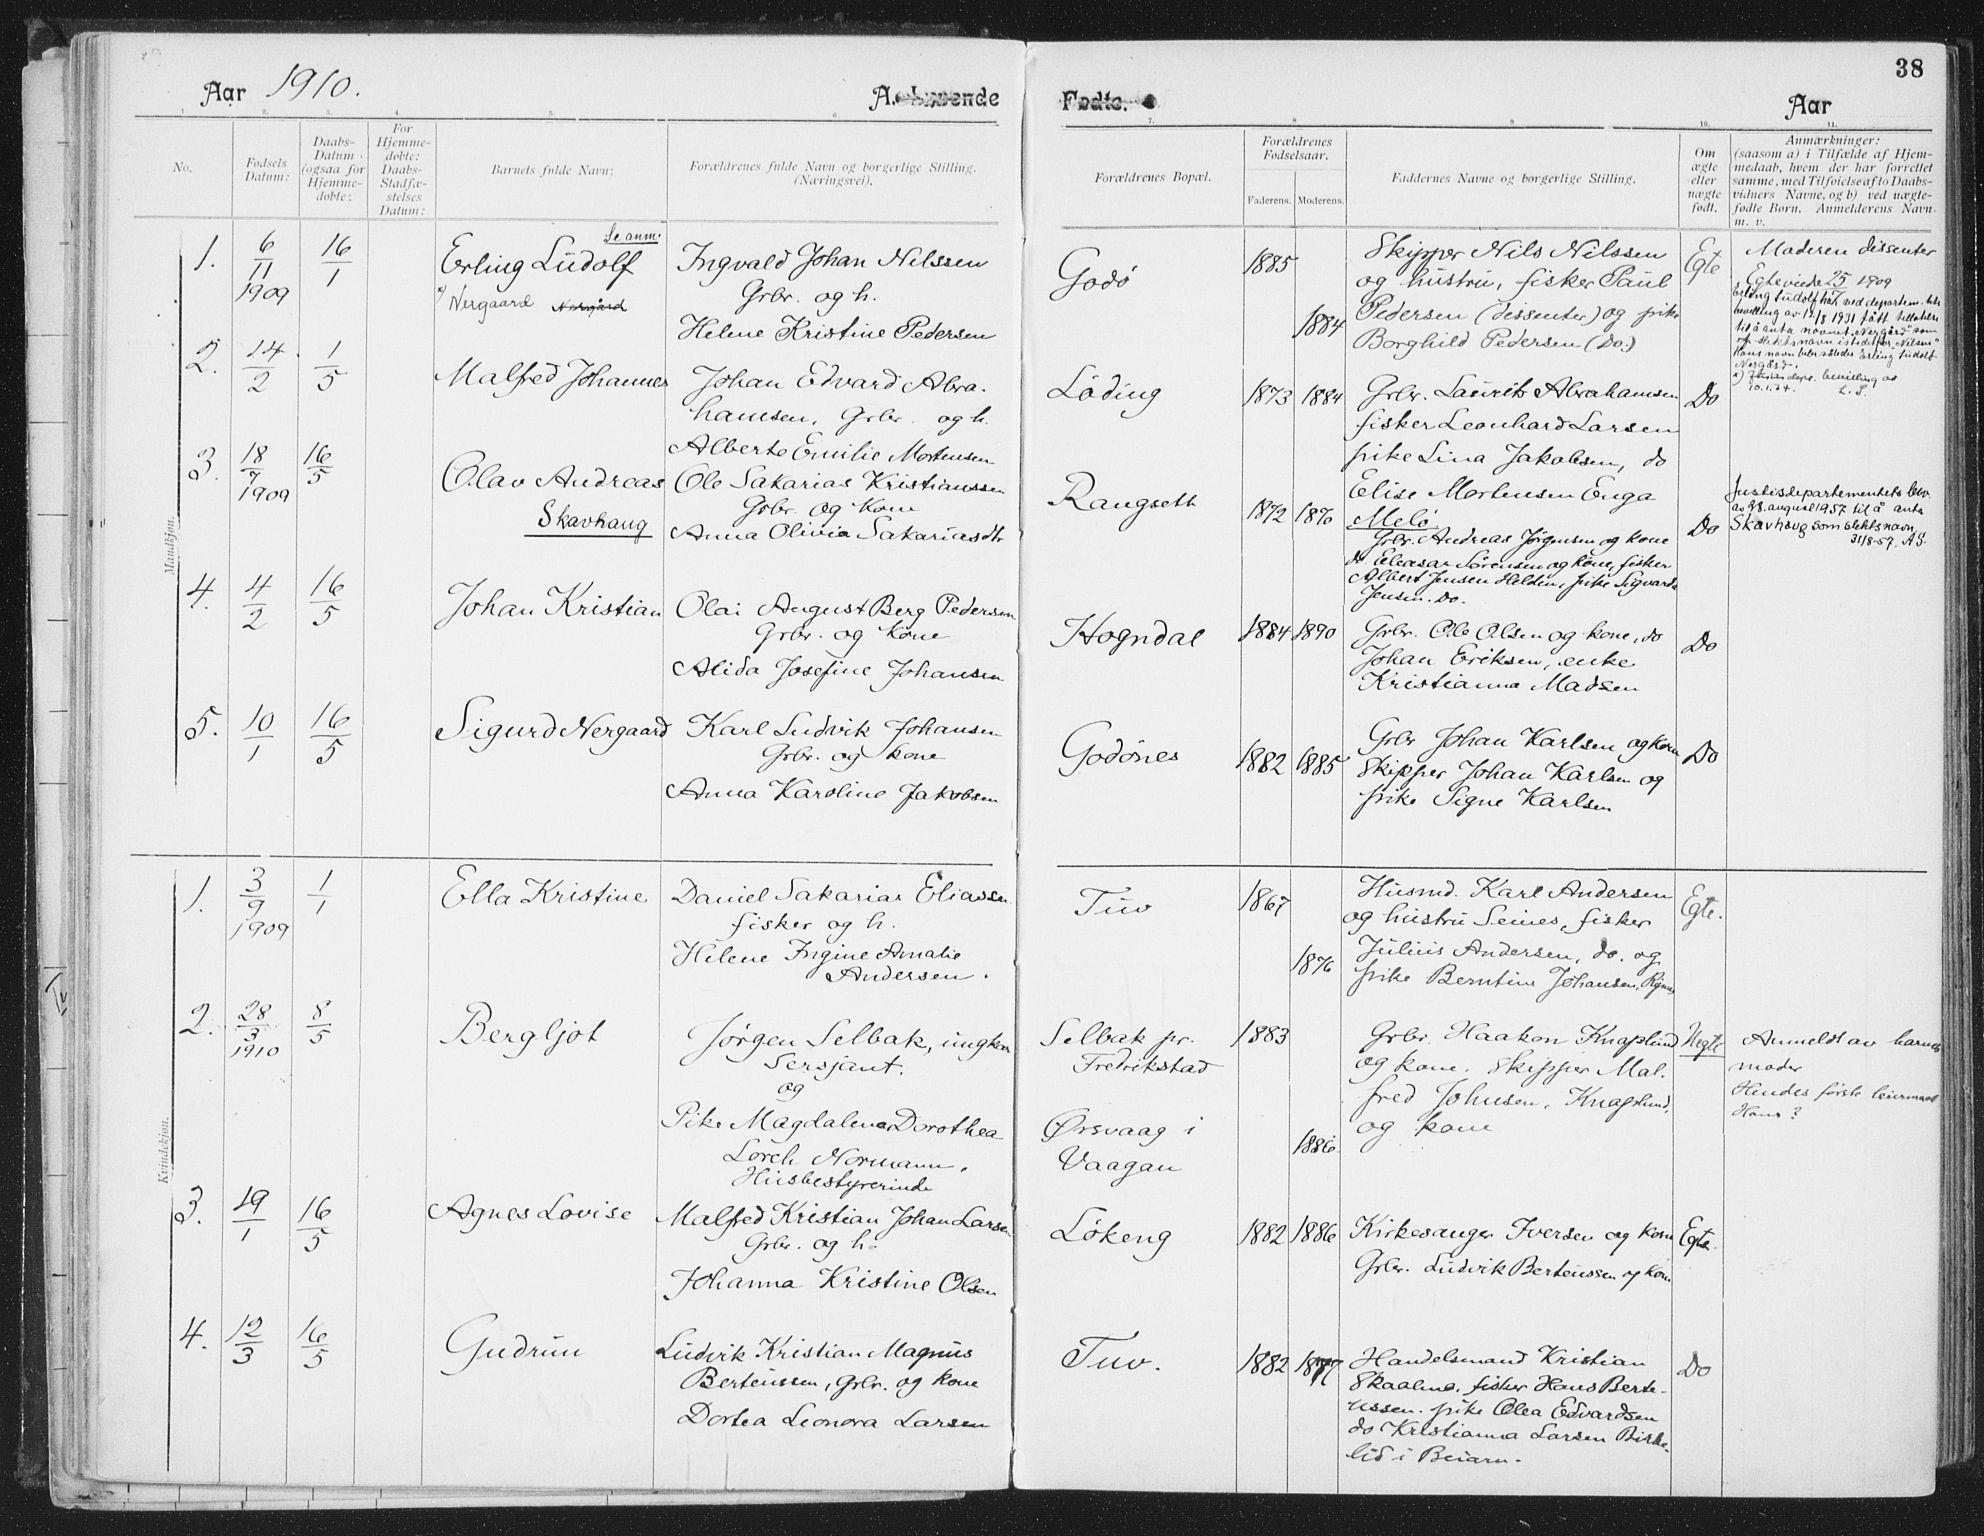 SAT, Ministerialprotokoller, klokkerbøker og fødselsregistre - Nordland, 804/L0081: Ministerialbok nr. 804A02, 1901-1915, s. 38